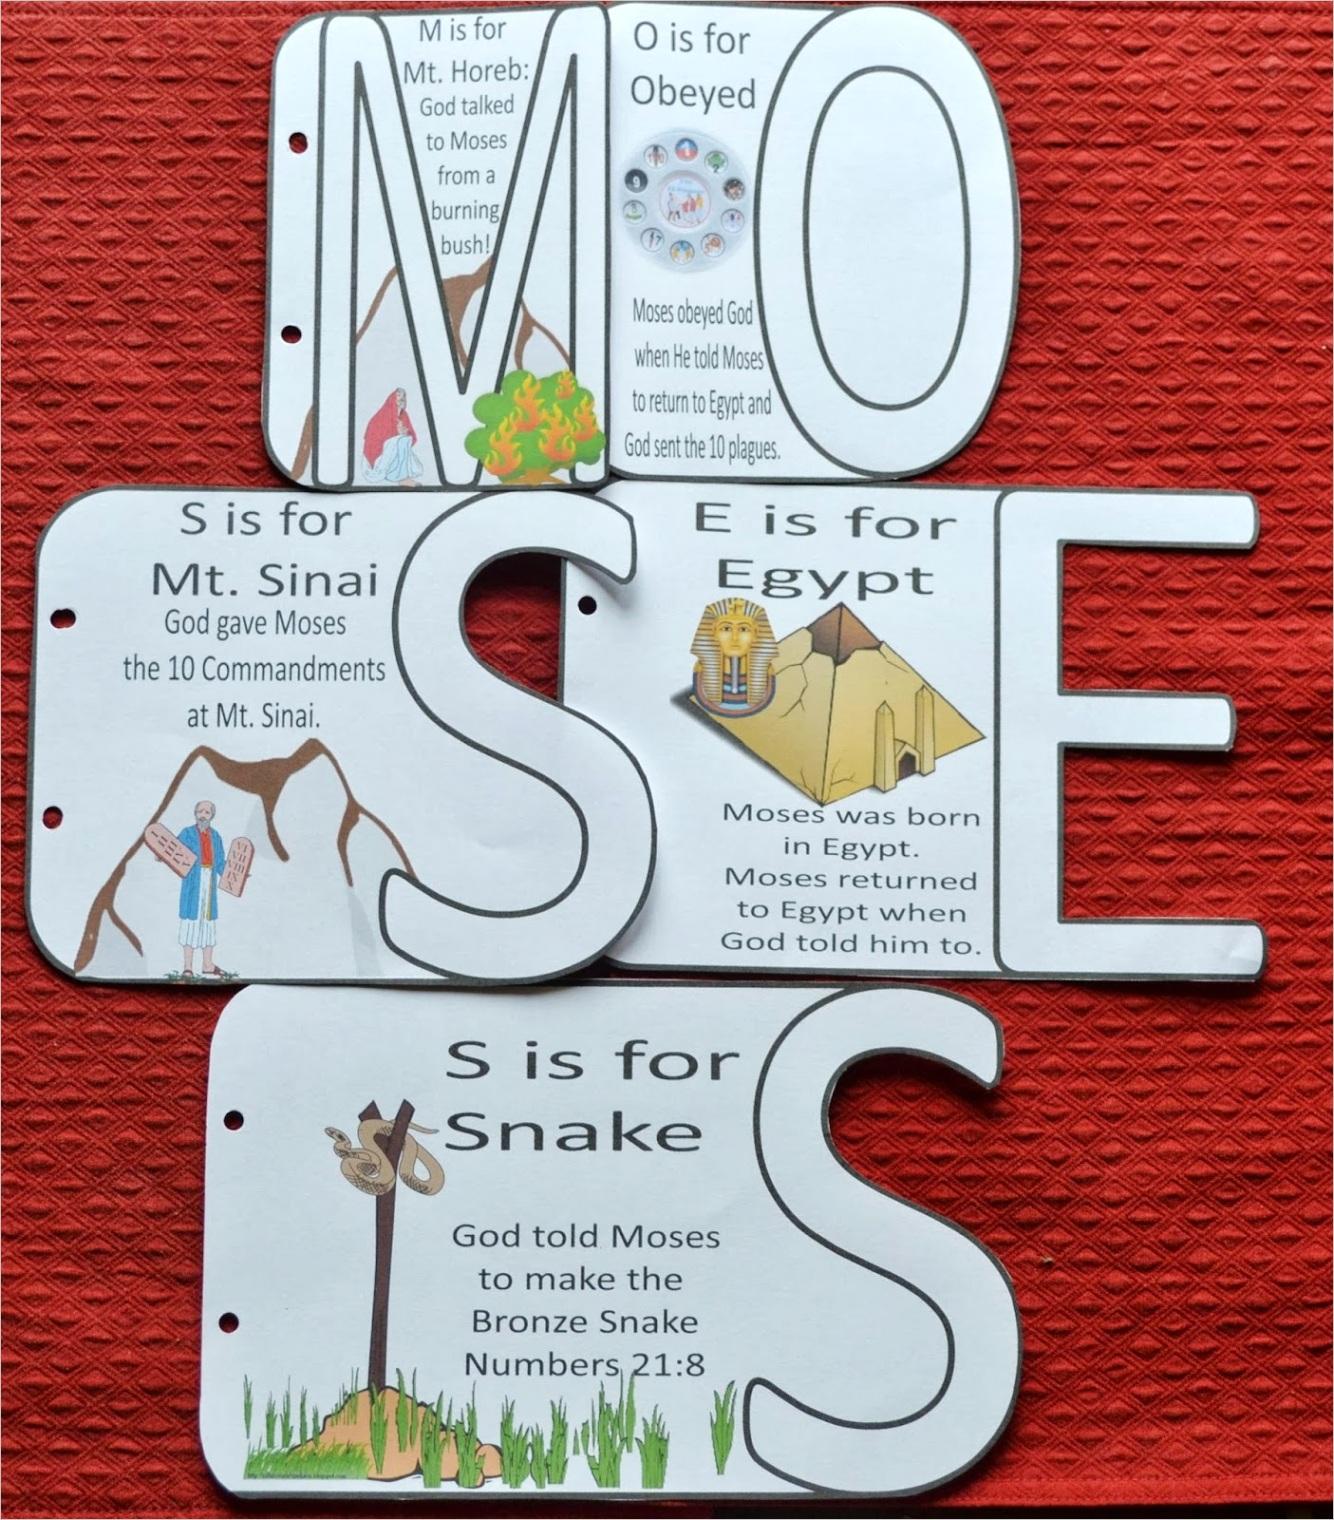 moses bronze snakeml